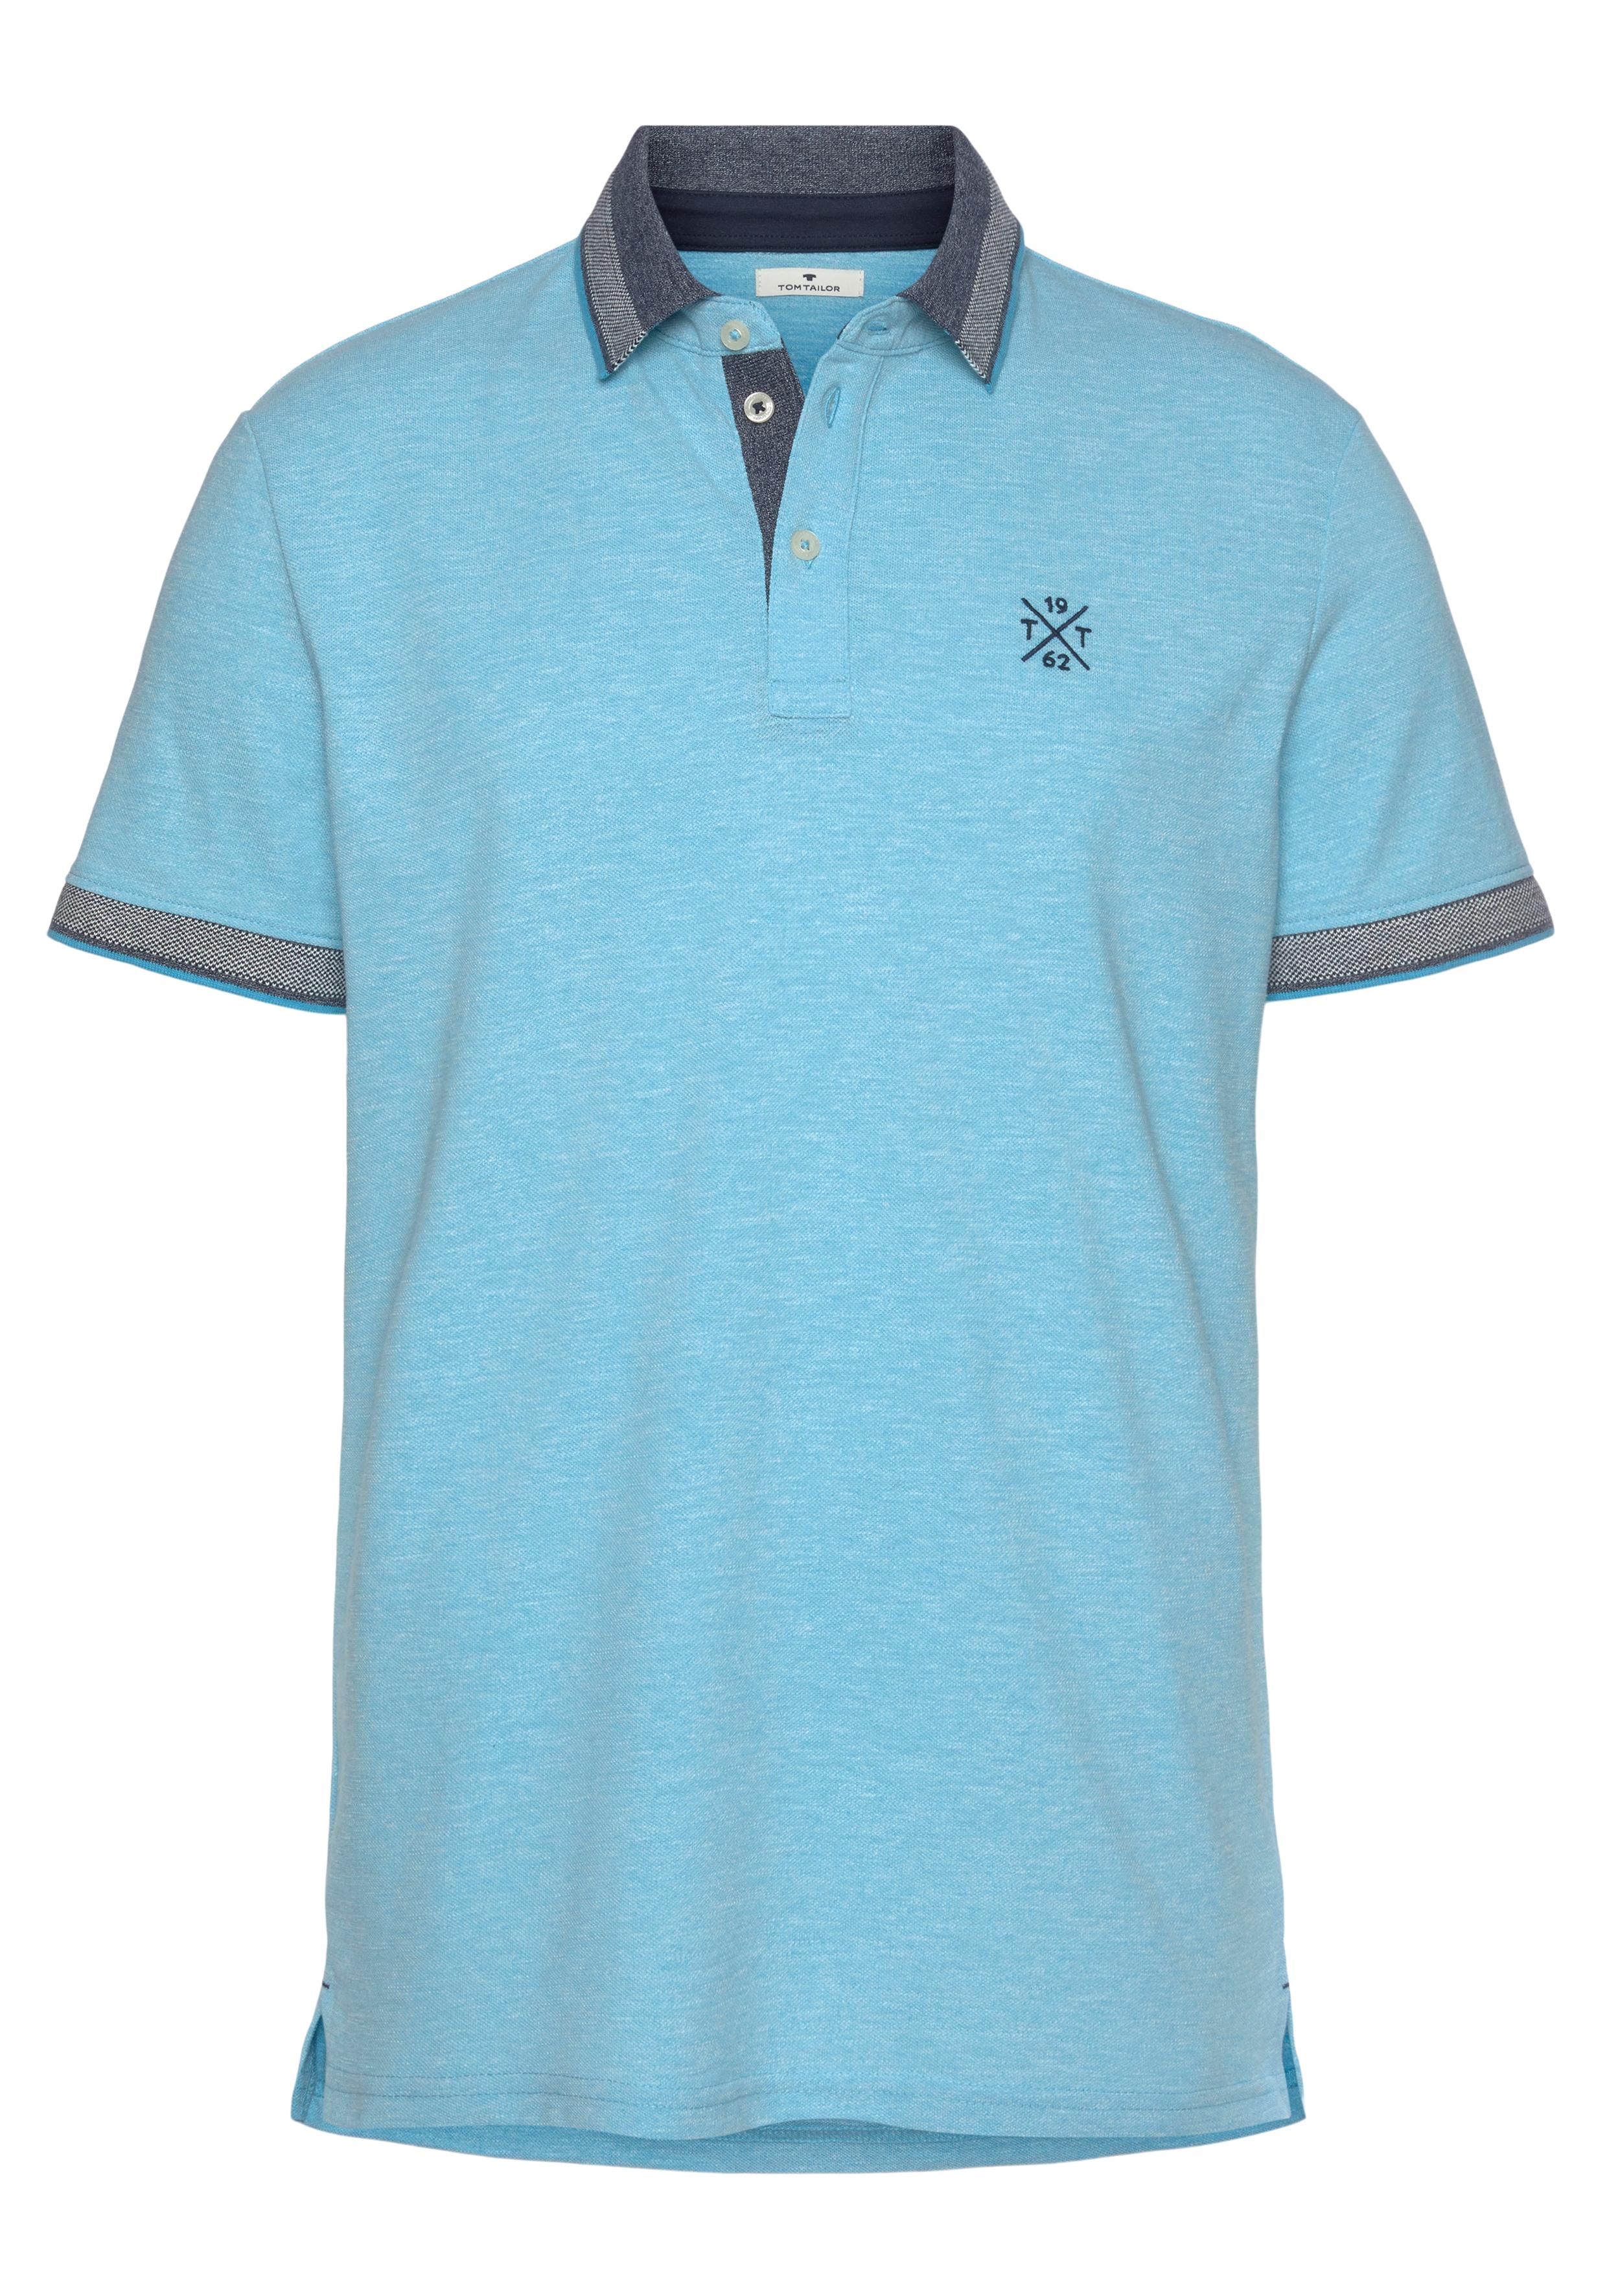 tom tailor -  Poloshirt, mit Logostickerei